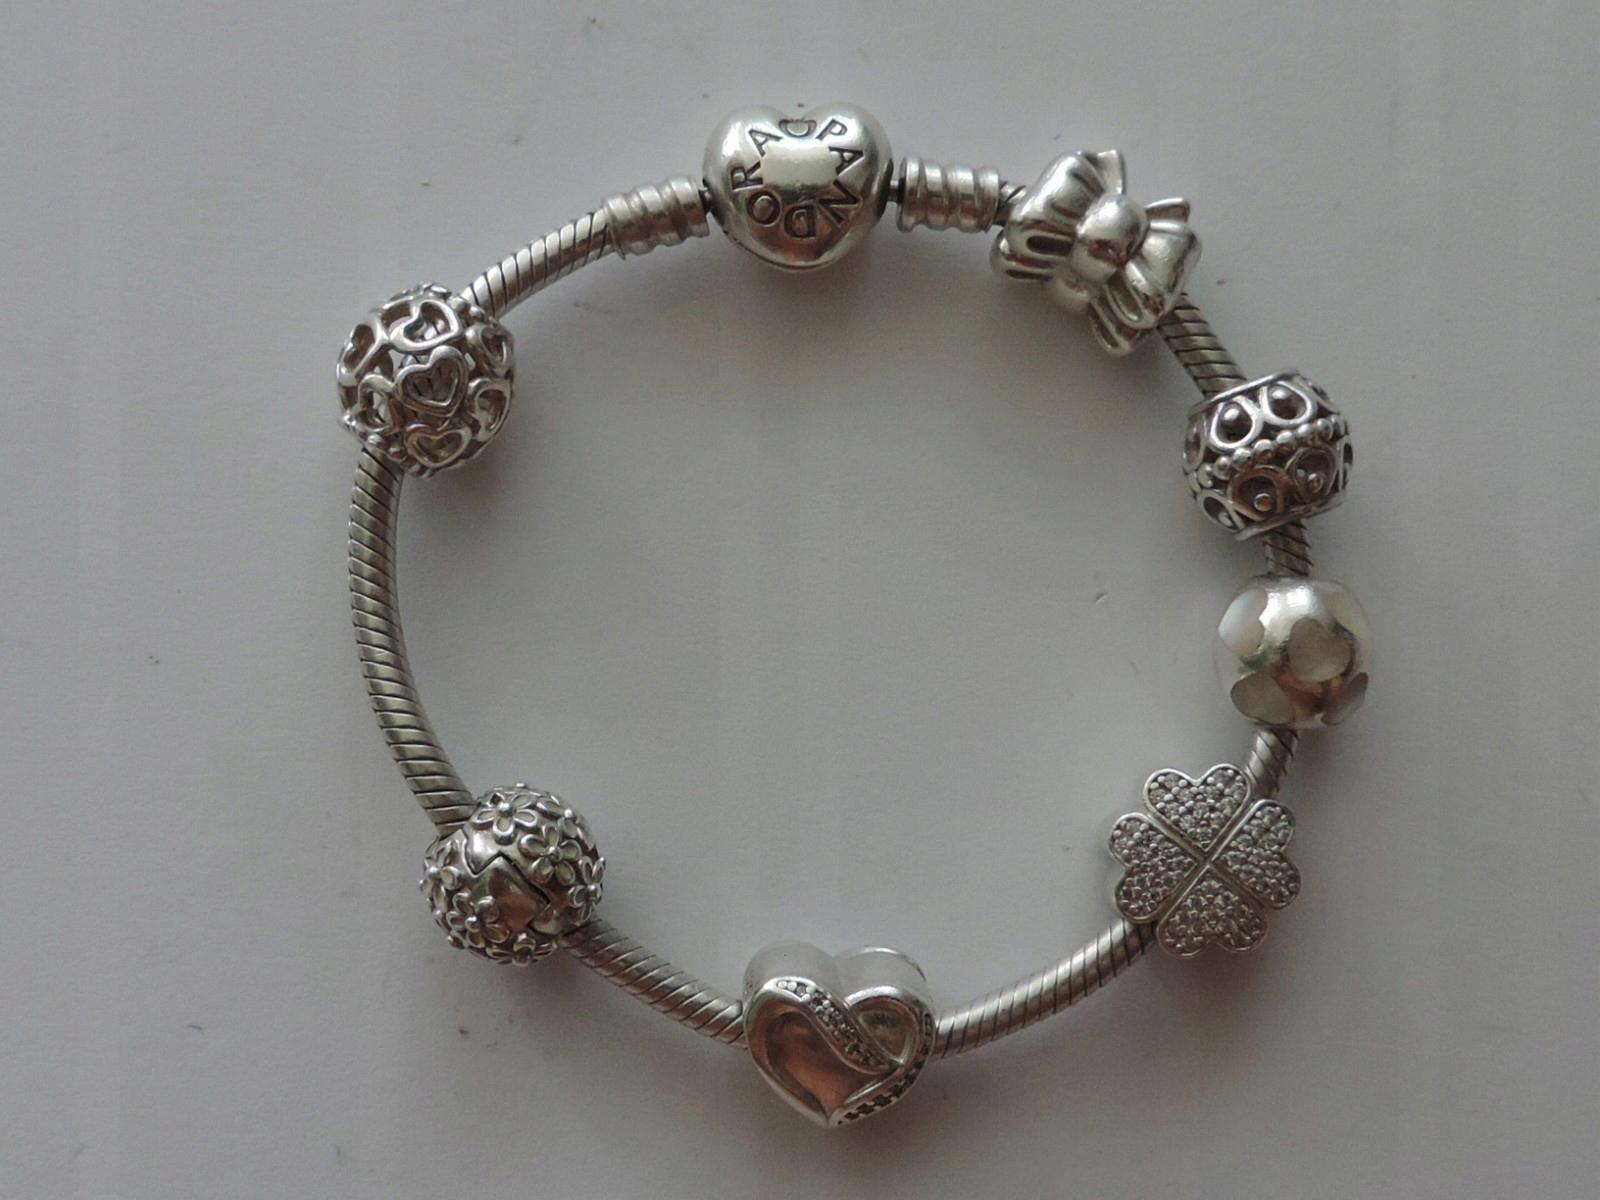 cdd54d0ebf50a8 Bransoletka srebrna Pandora oryginalna 17 cm - 7427668885 ...